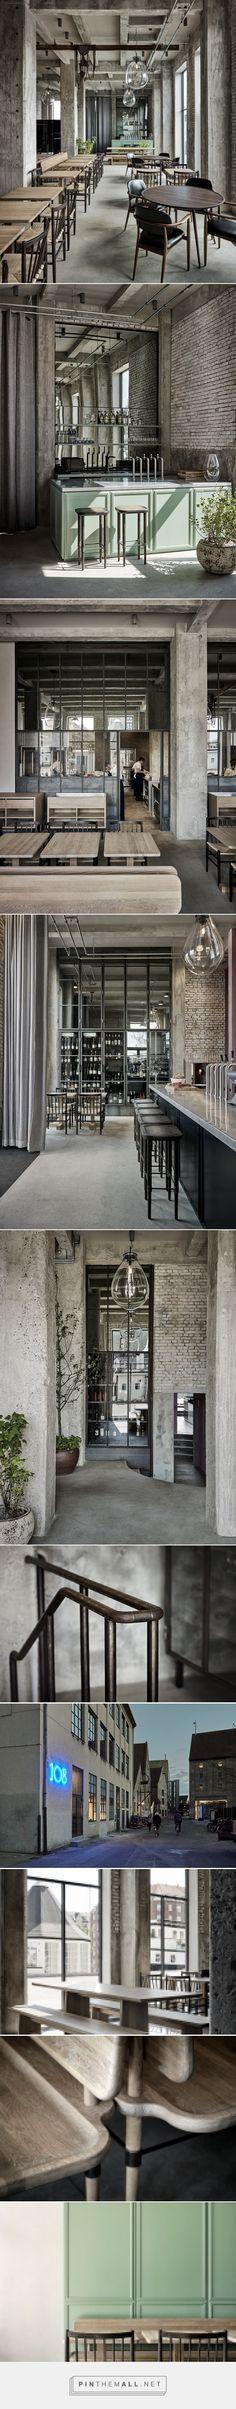 SPACE copenhagen converts warehouse into restaurant 108 http://www.designboom.com/architecture/space-copenhagen-restaurant-108-copenhagen-rene-redzepi-interiors-11-23-2016/ - created via https://pinthemall.net